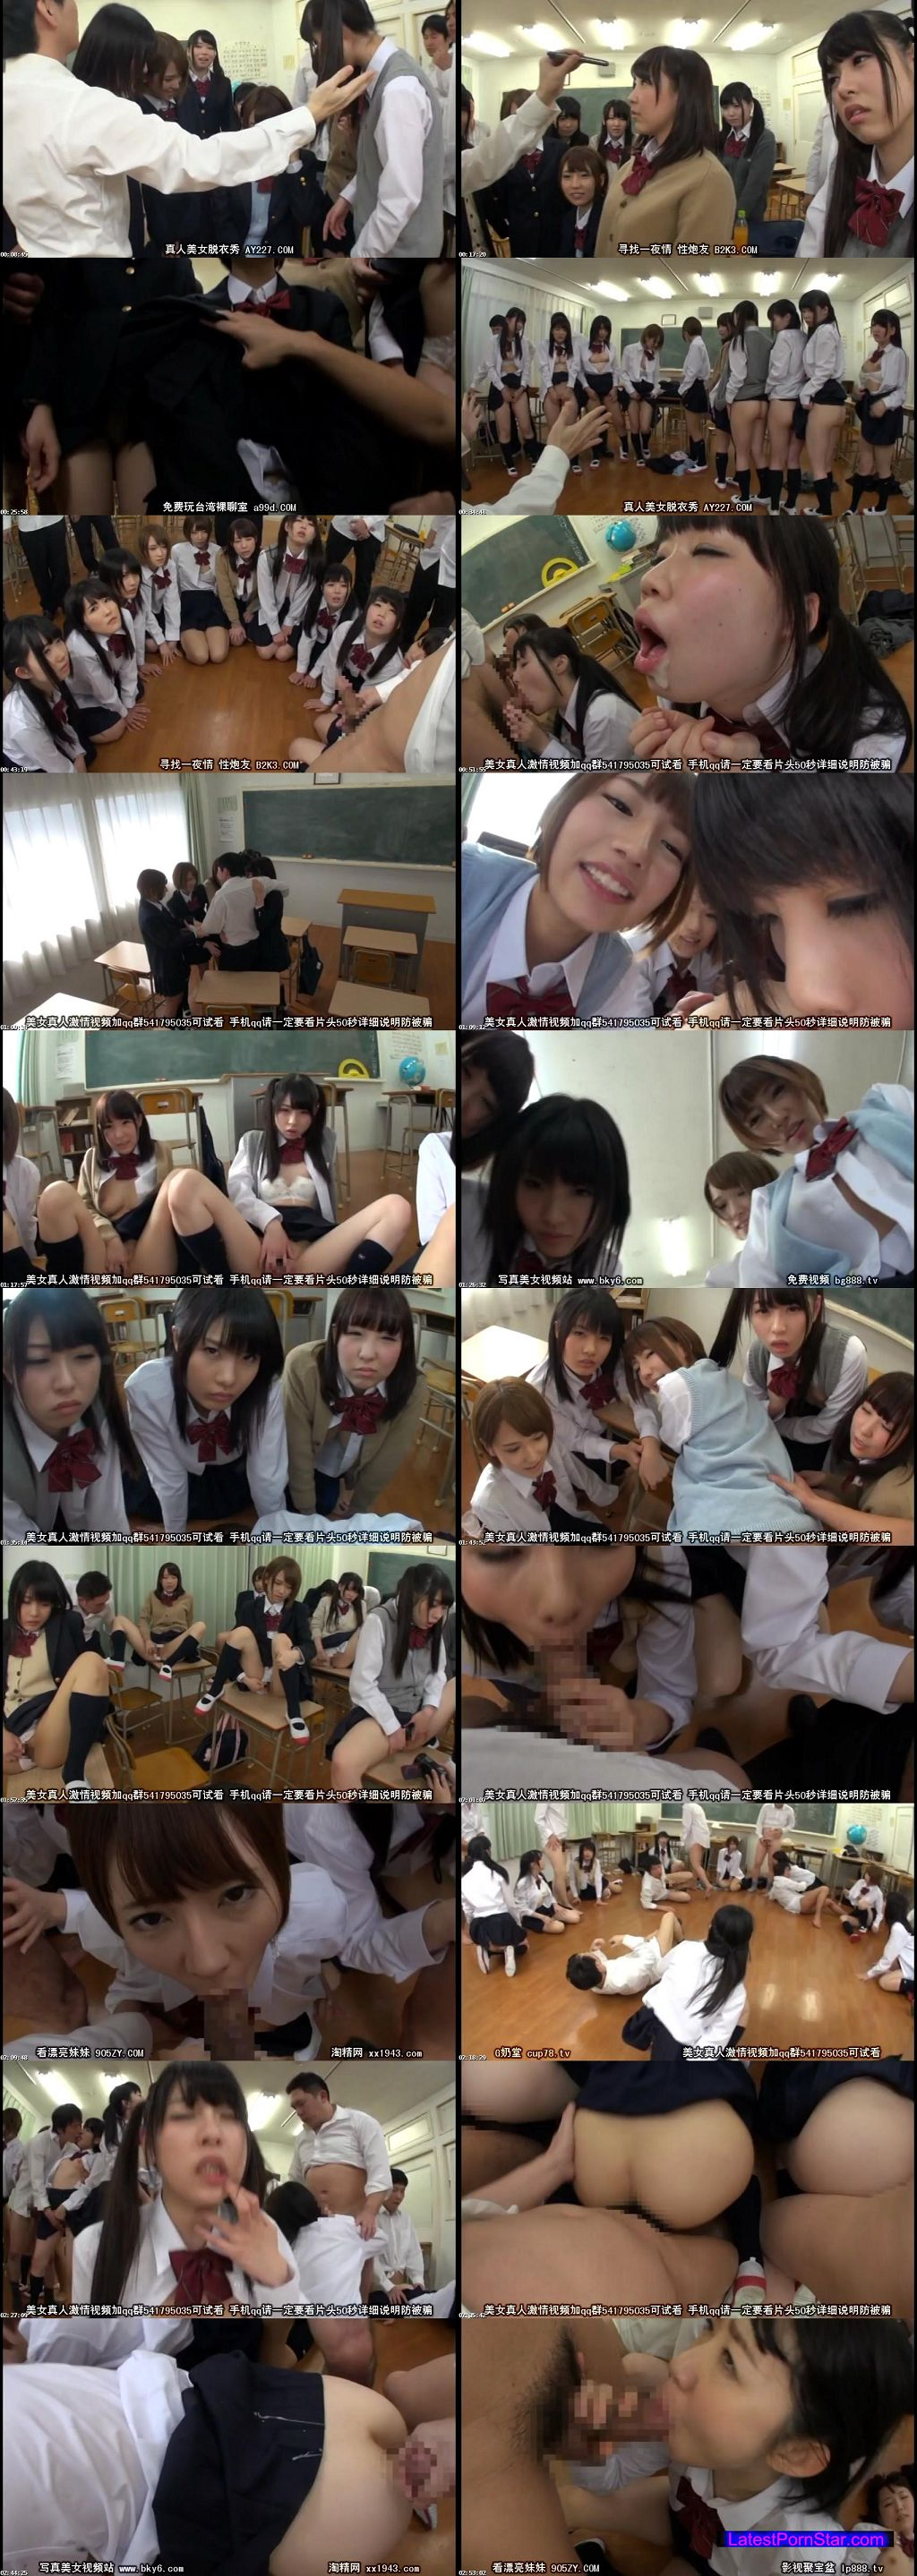 [T28-452] 女子校生集団催眠中出し乱交